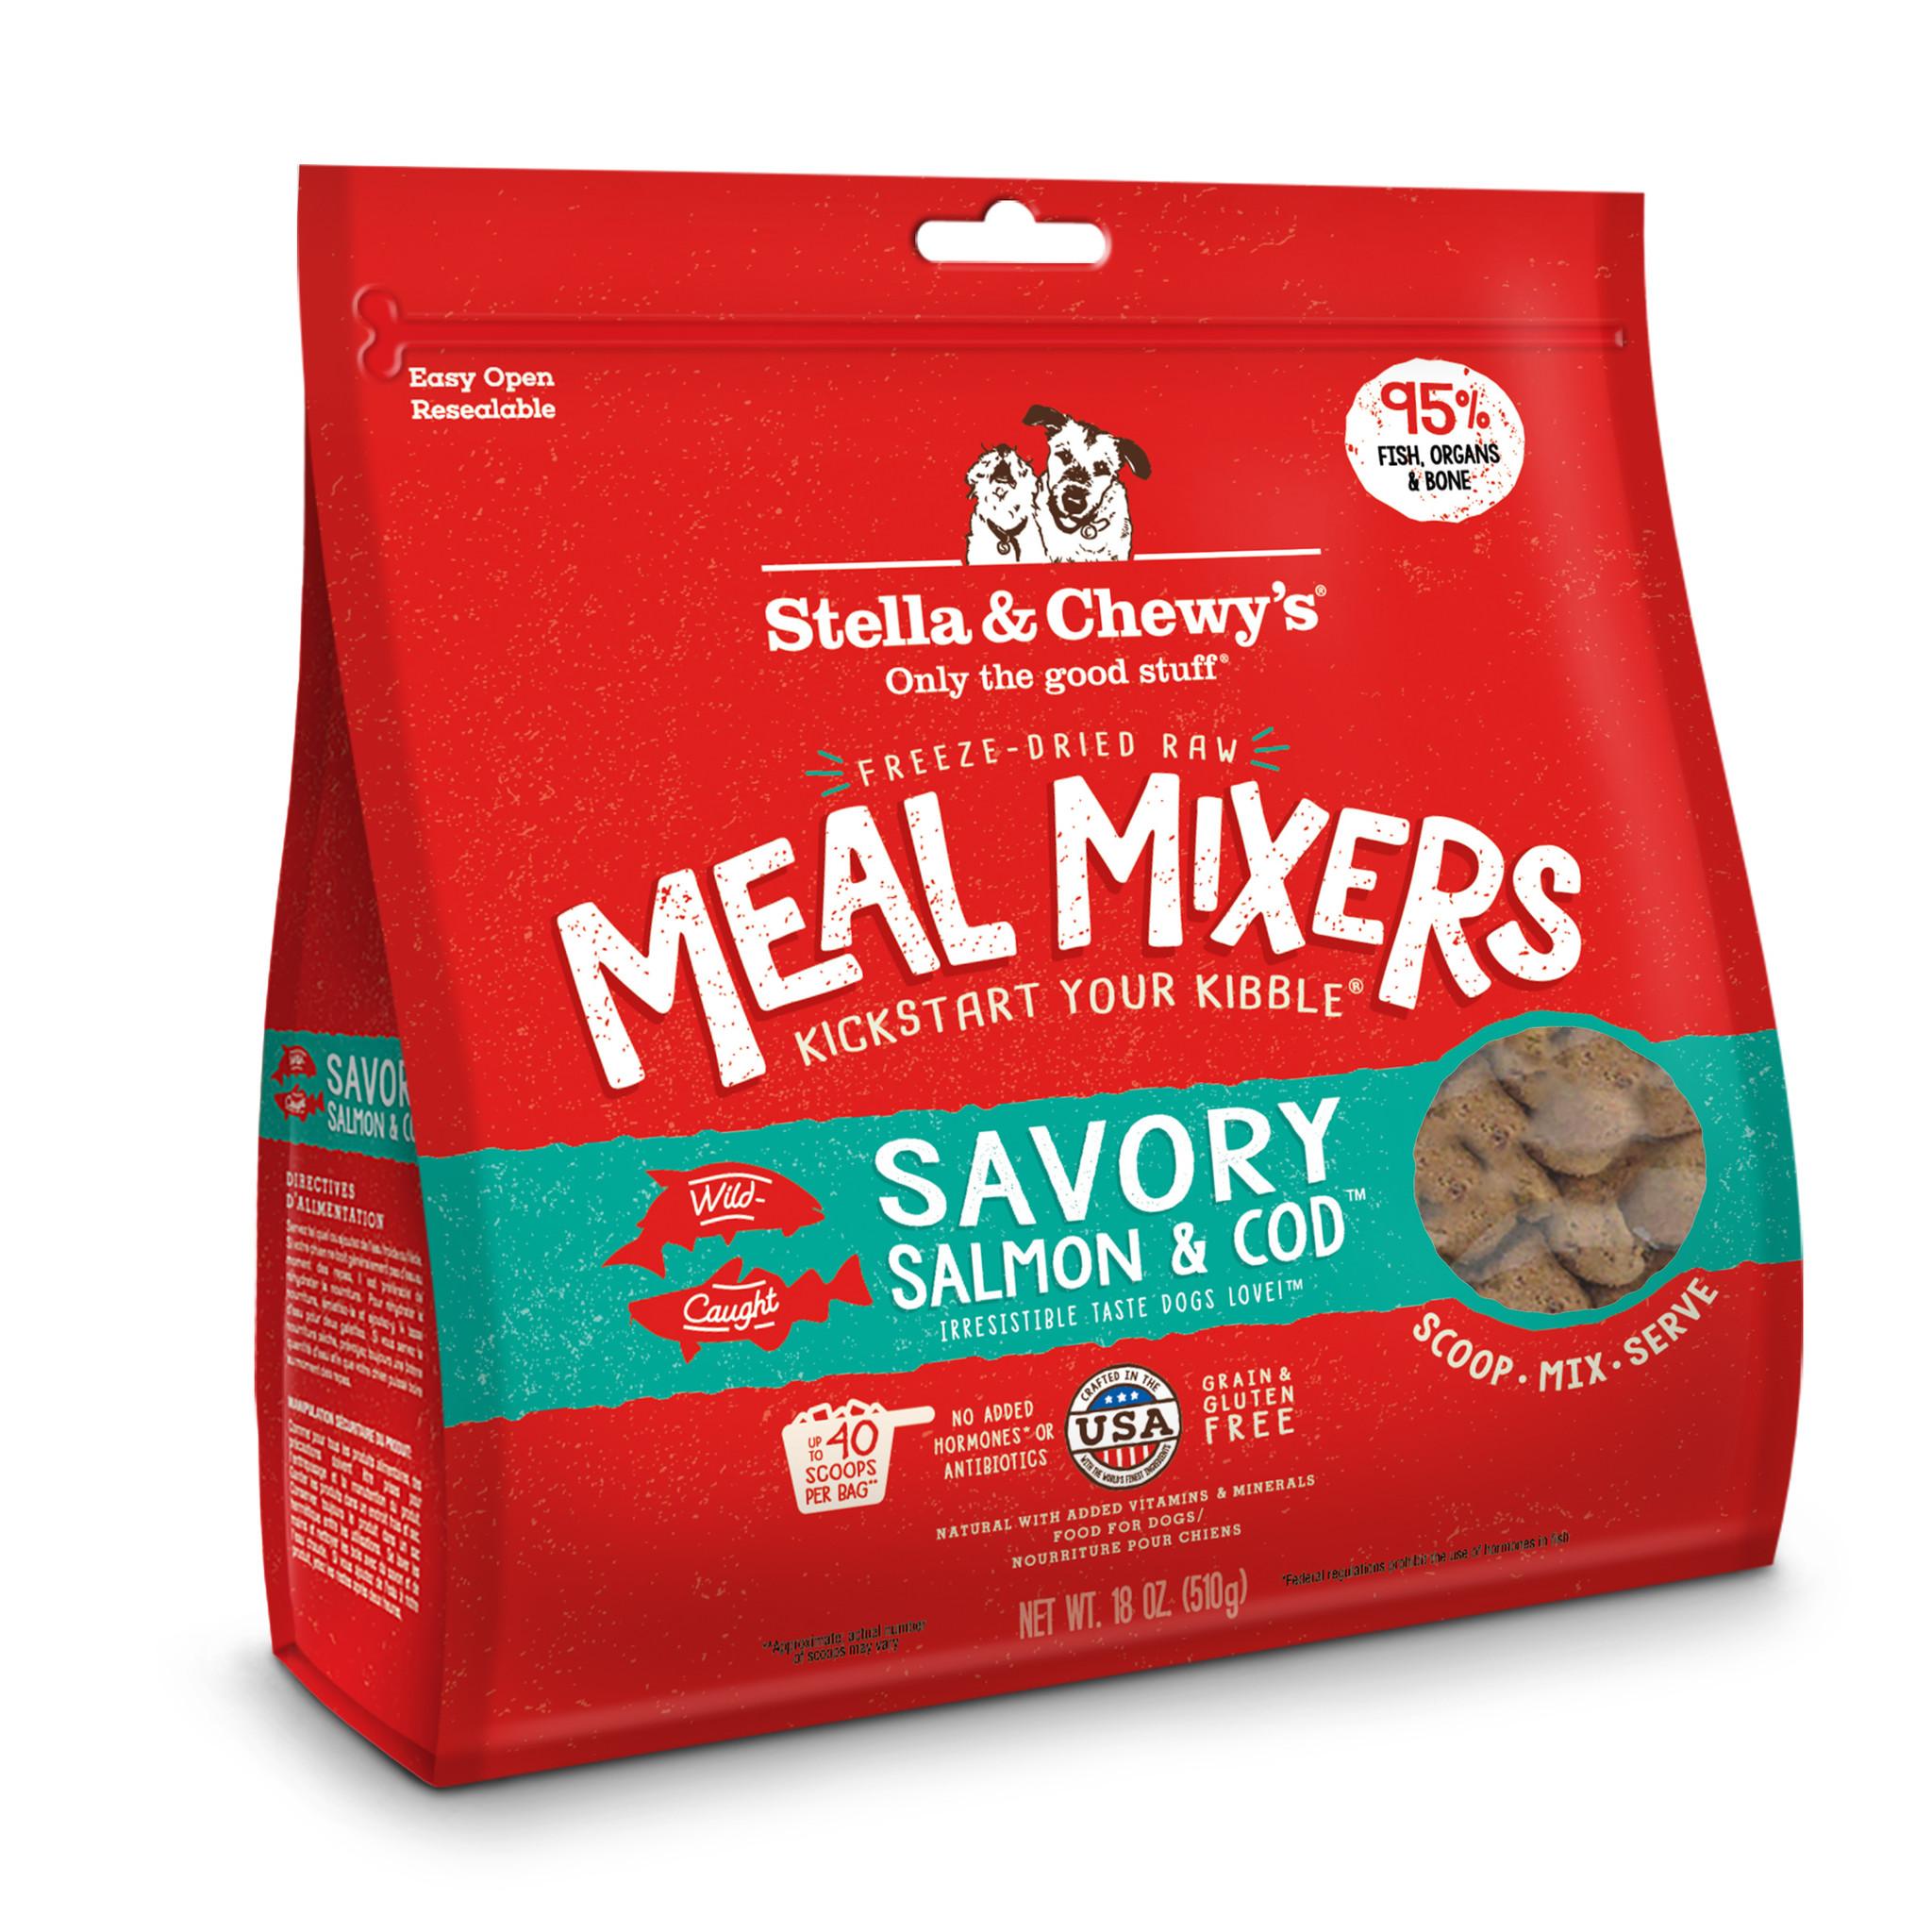 Stella & Chewys Stella & Chewys Savory Salmon & Cod Meal Mixer